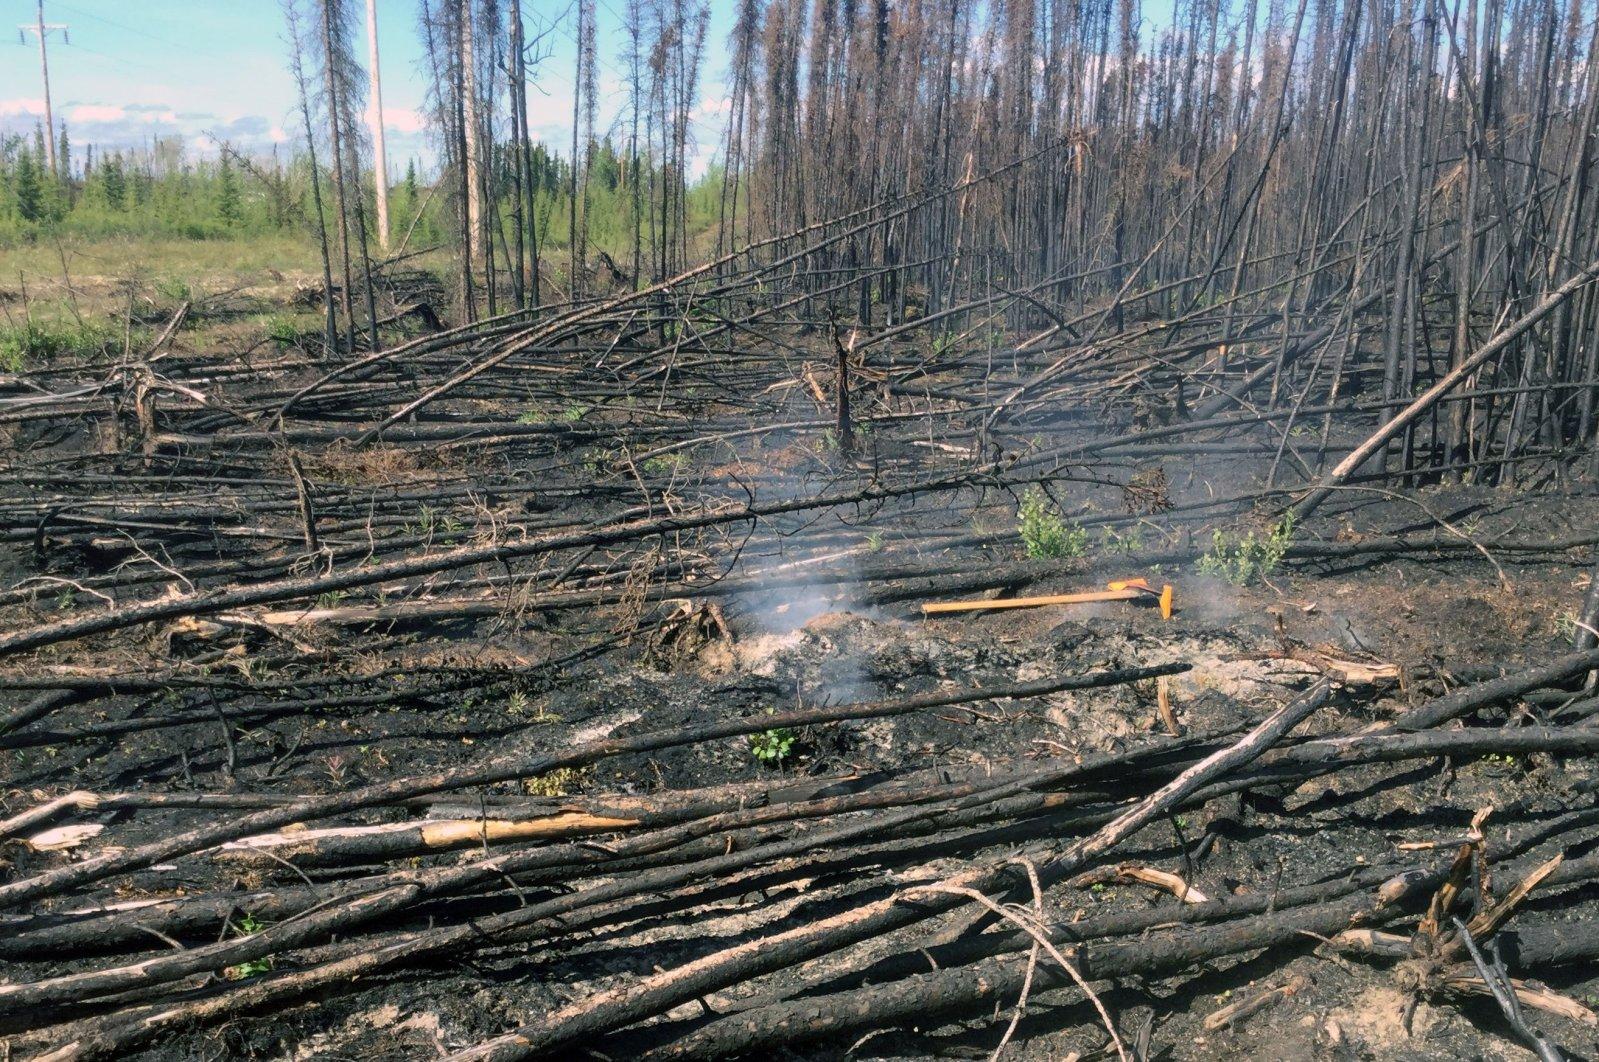 Smoke rises from a hot spot in the Swan Lake Fire scar at the Kenai National Wildlife Refuge, Alaska, U.S., June 16, 2020. (Reuters Photo)